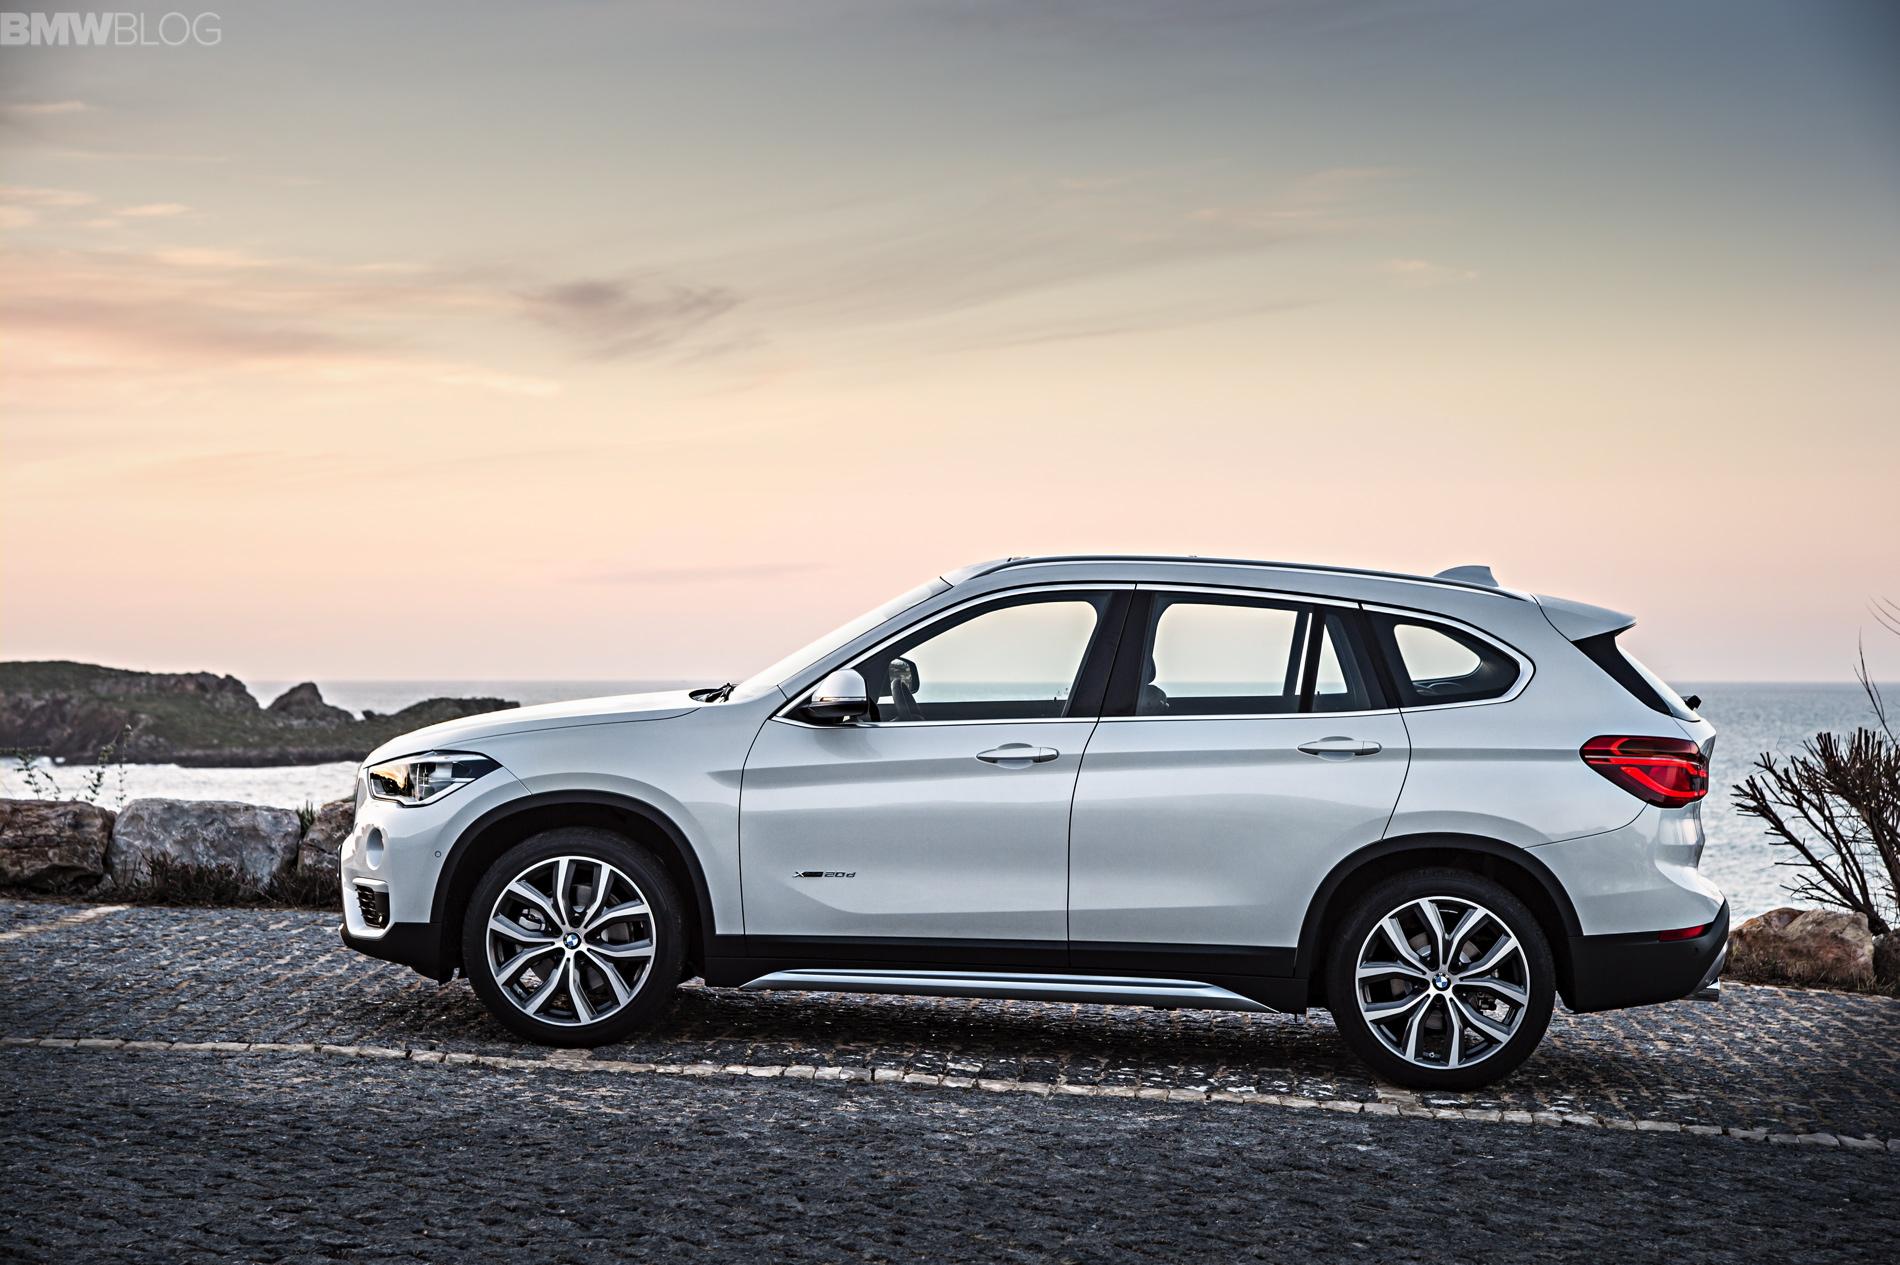 ... 2016 BMW X1 Exterior 1900x1200 Images 18